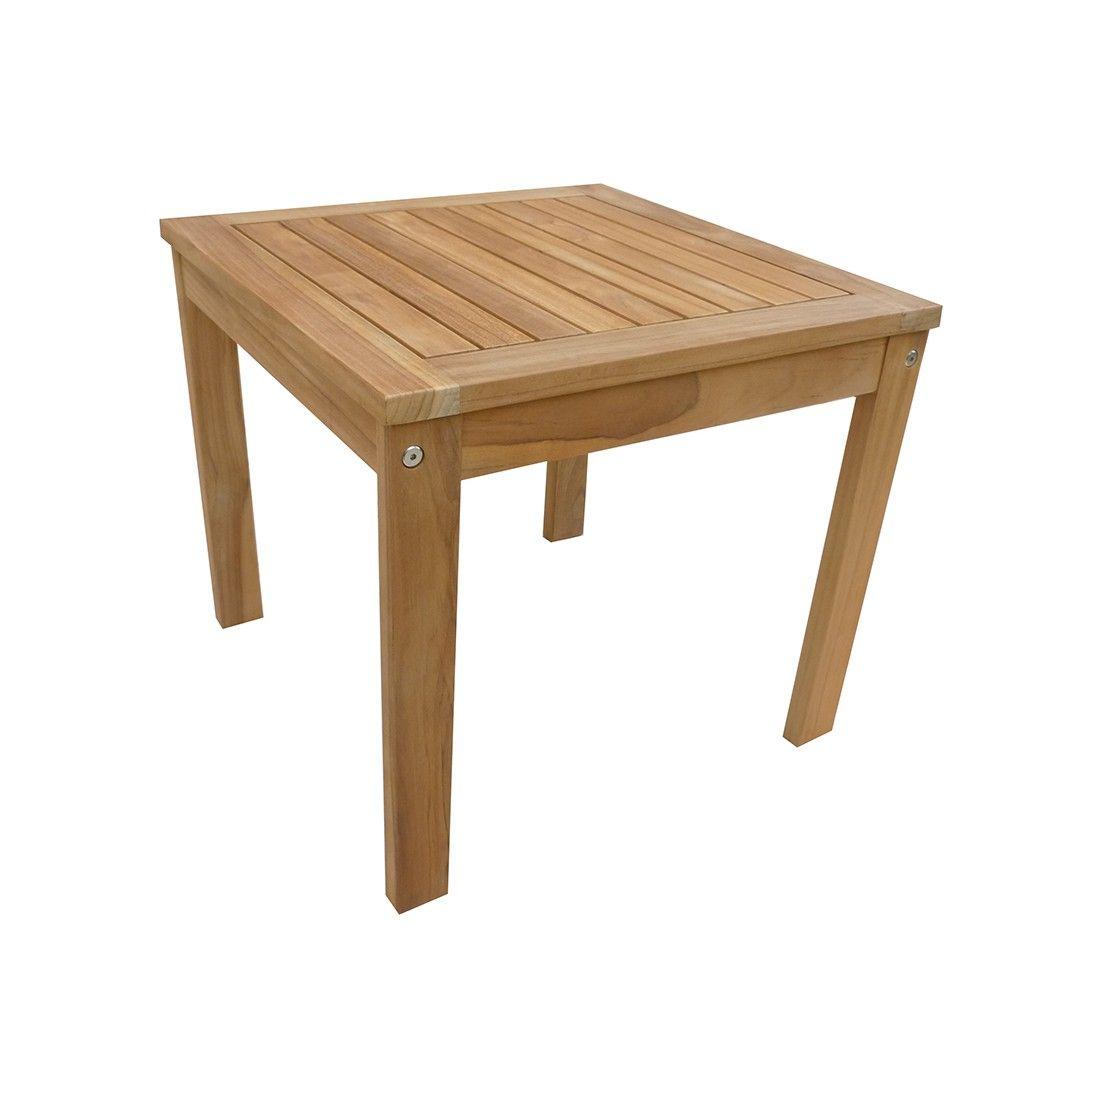 Petite table basse carrée 50 cm en teck massif, Sevilla